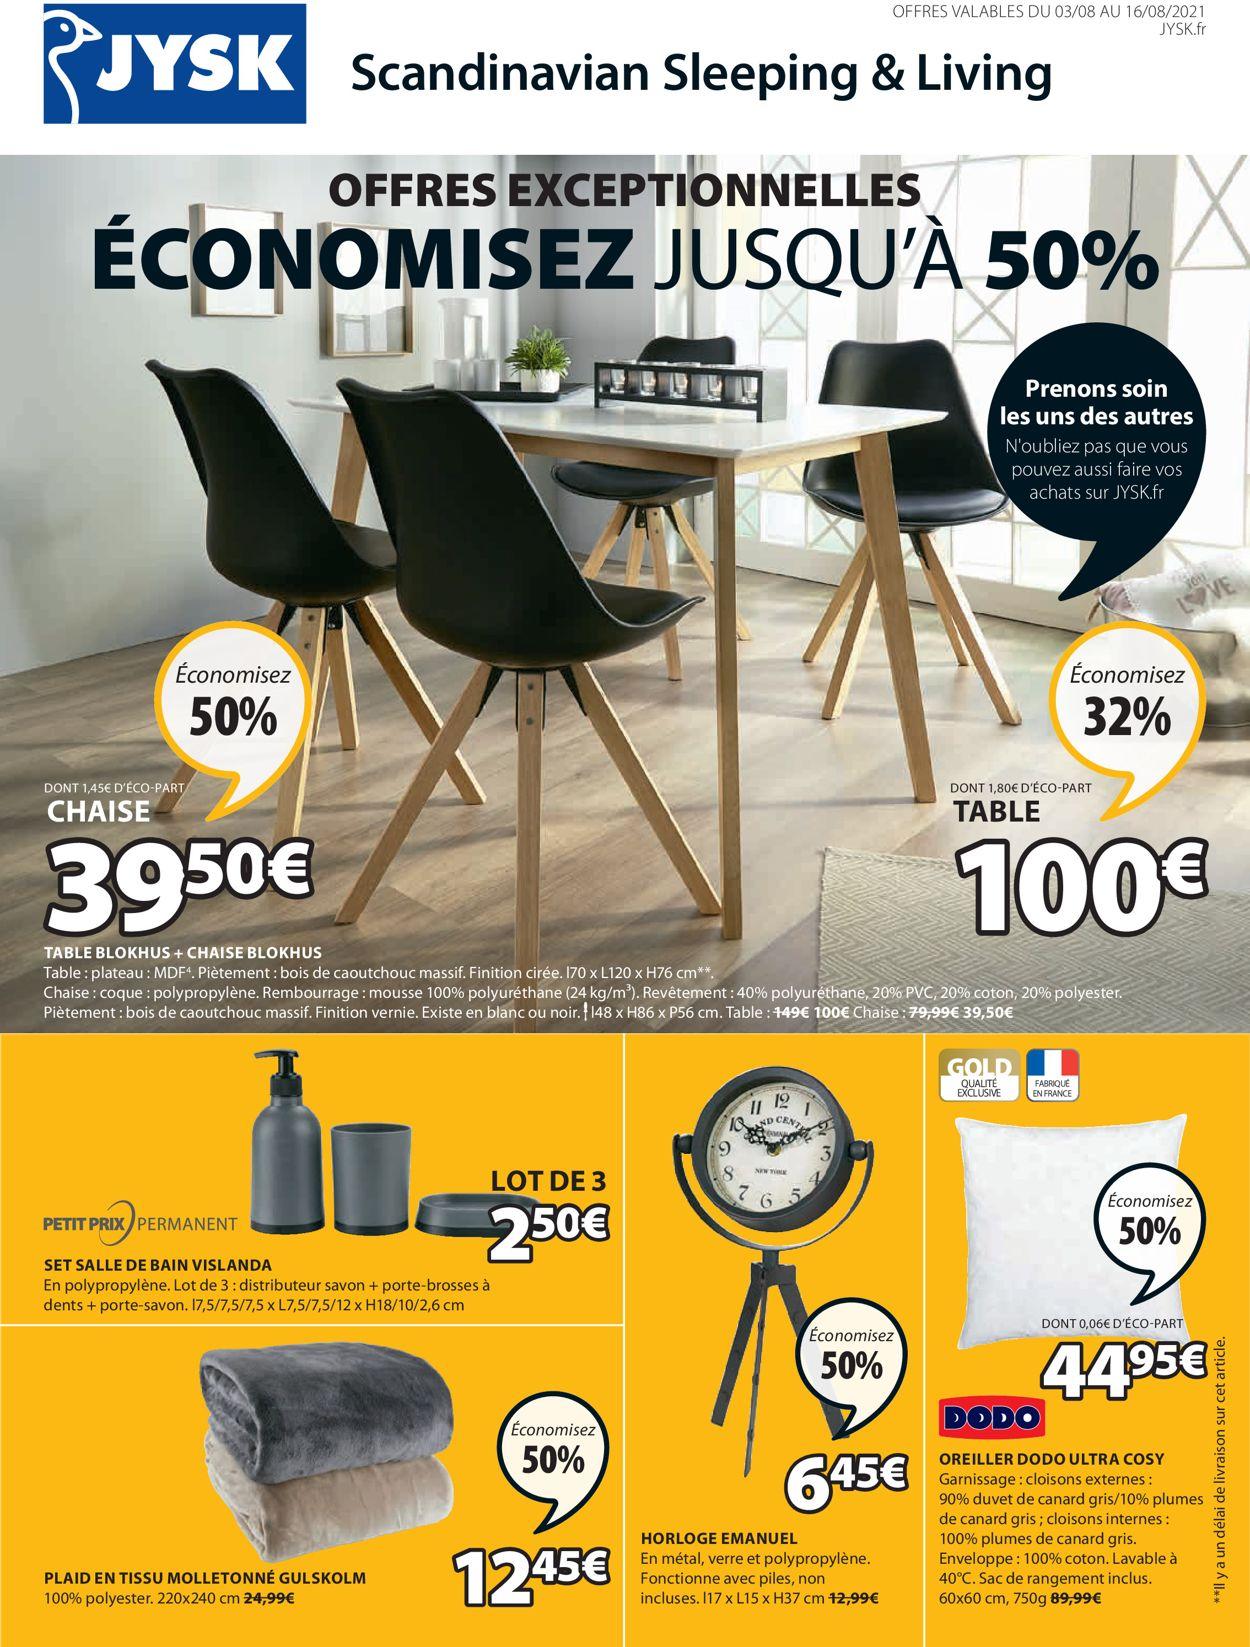 JYSK Catalogue - 03.08-16.08.2021